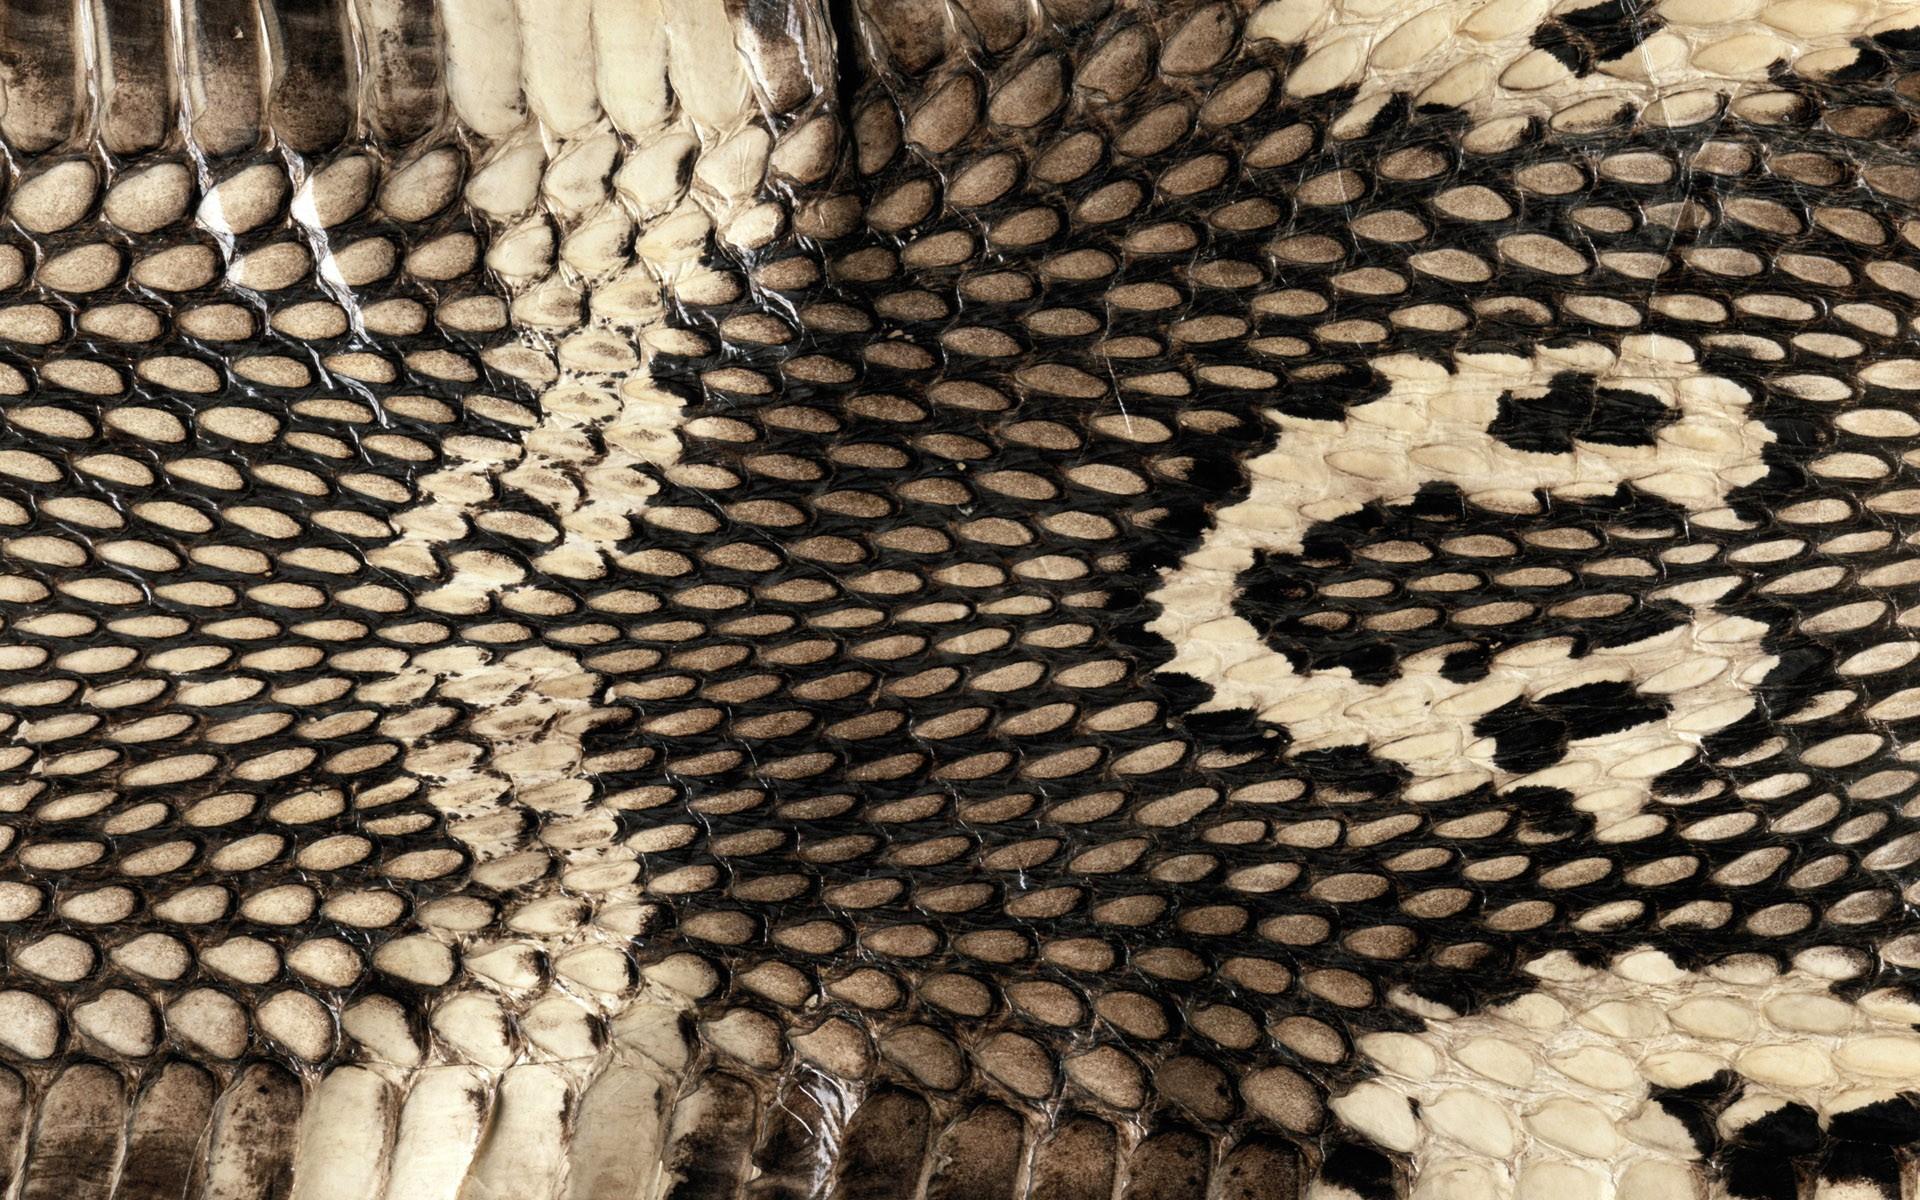 Cobra Snake Skin Wallpapers Cobra Snake Skin Myspace Backgrounds 1920x1200